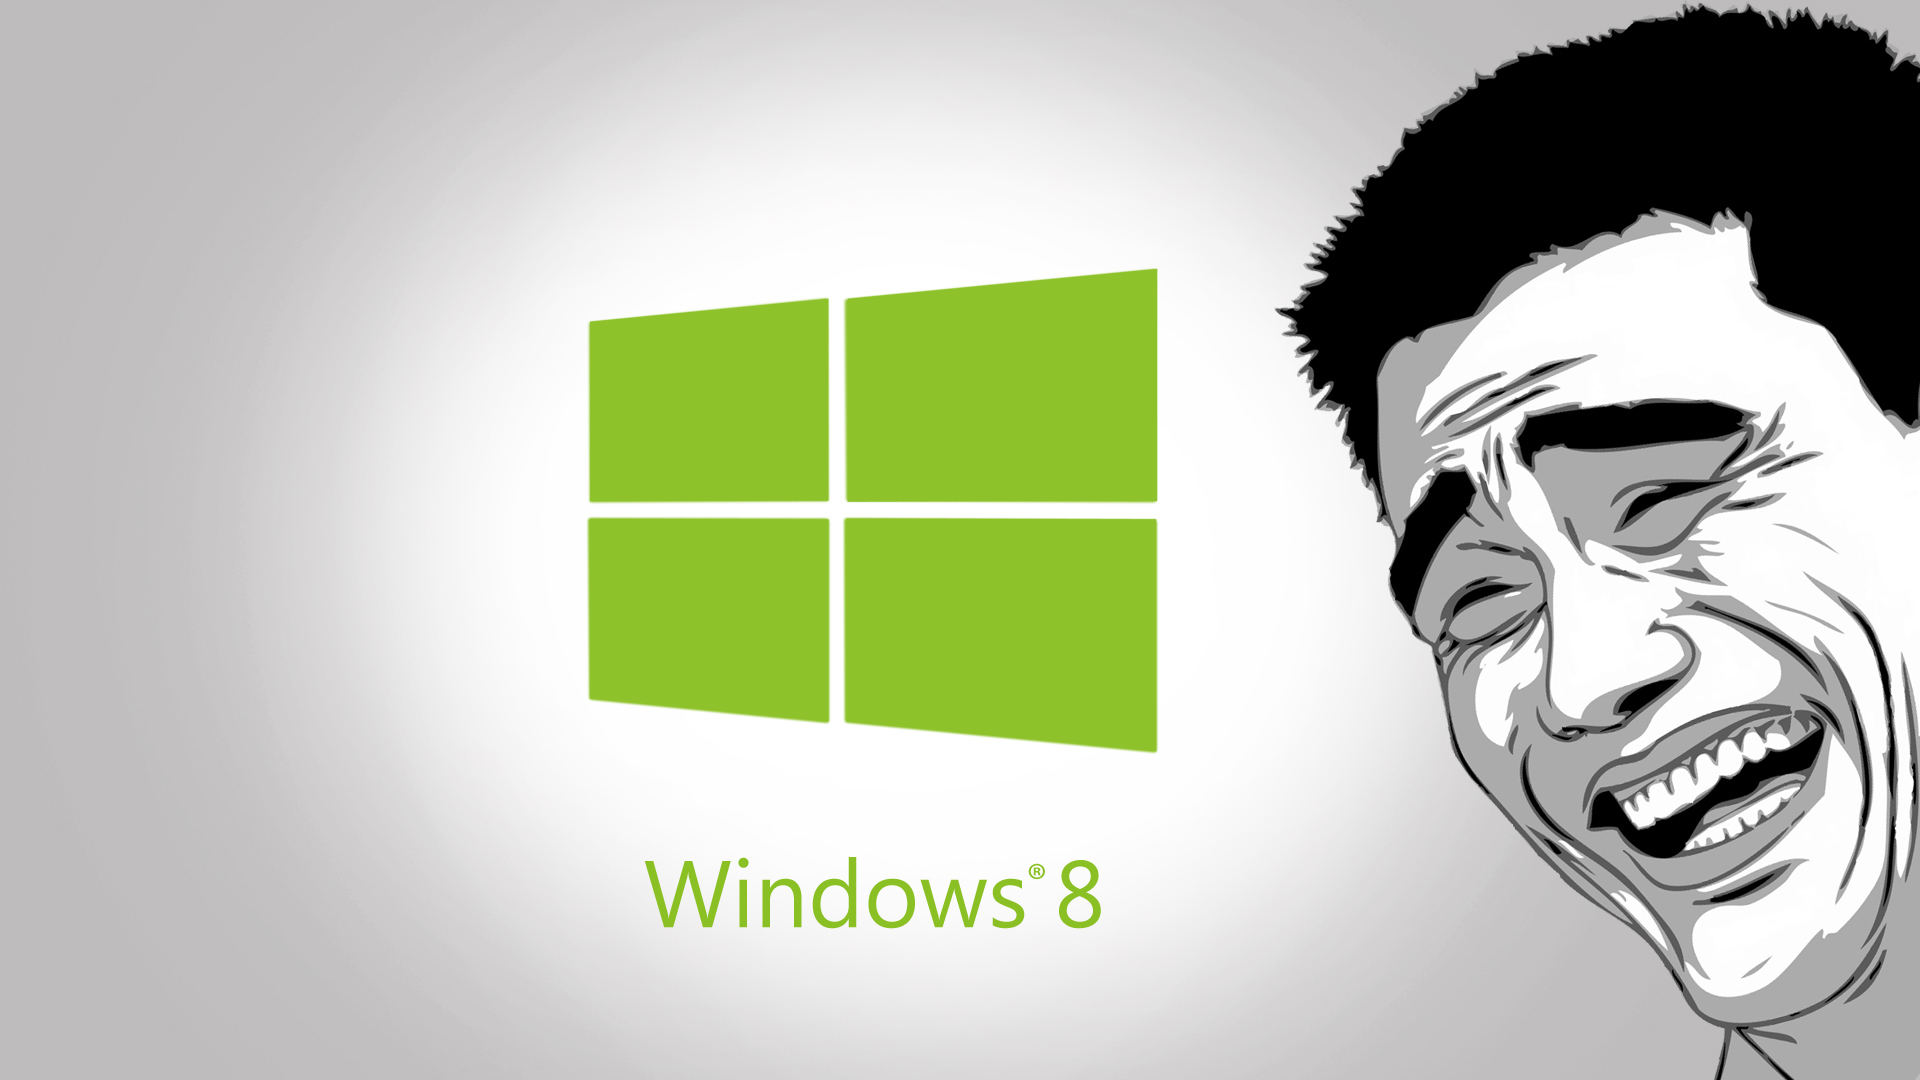 windows-8-please-comic-wallpaper-hd-2